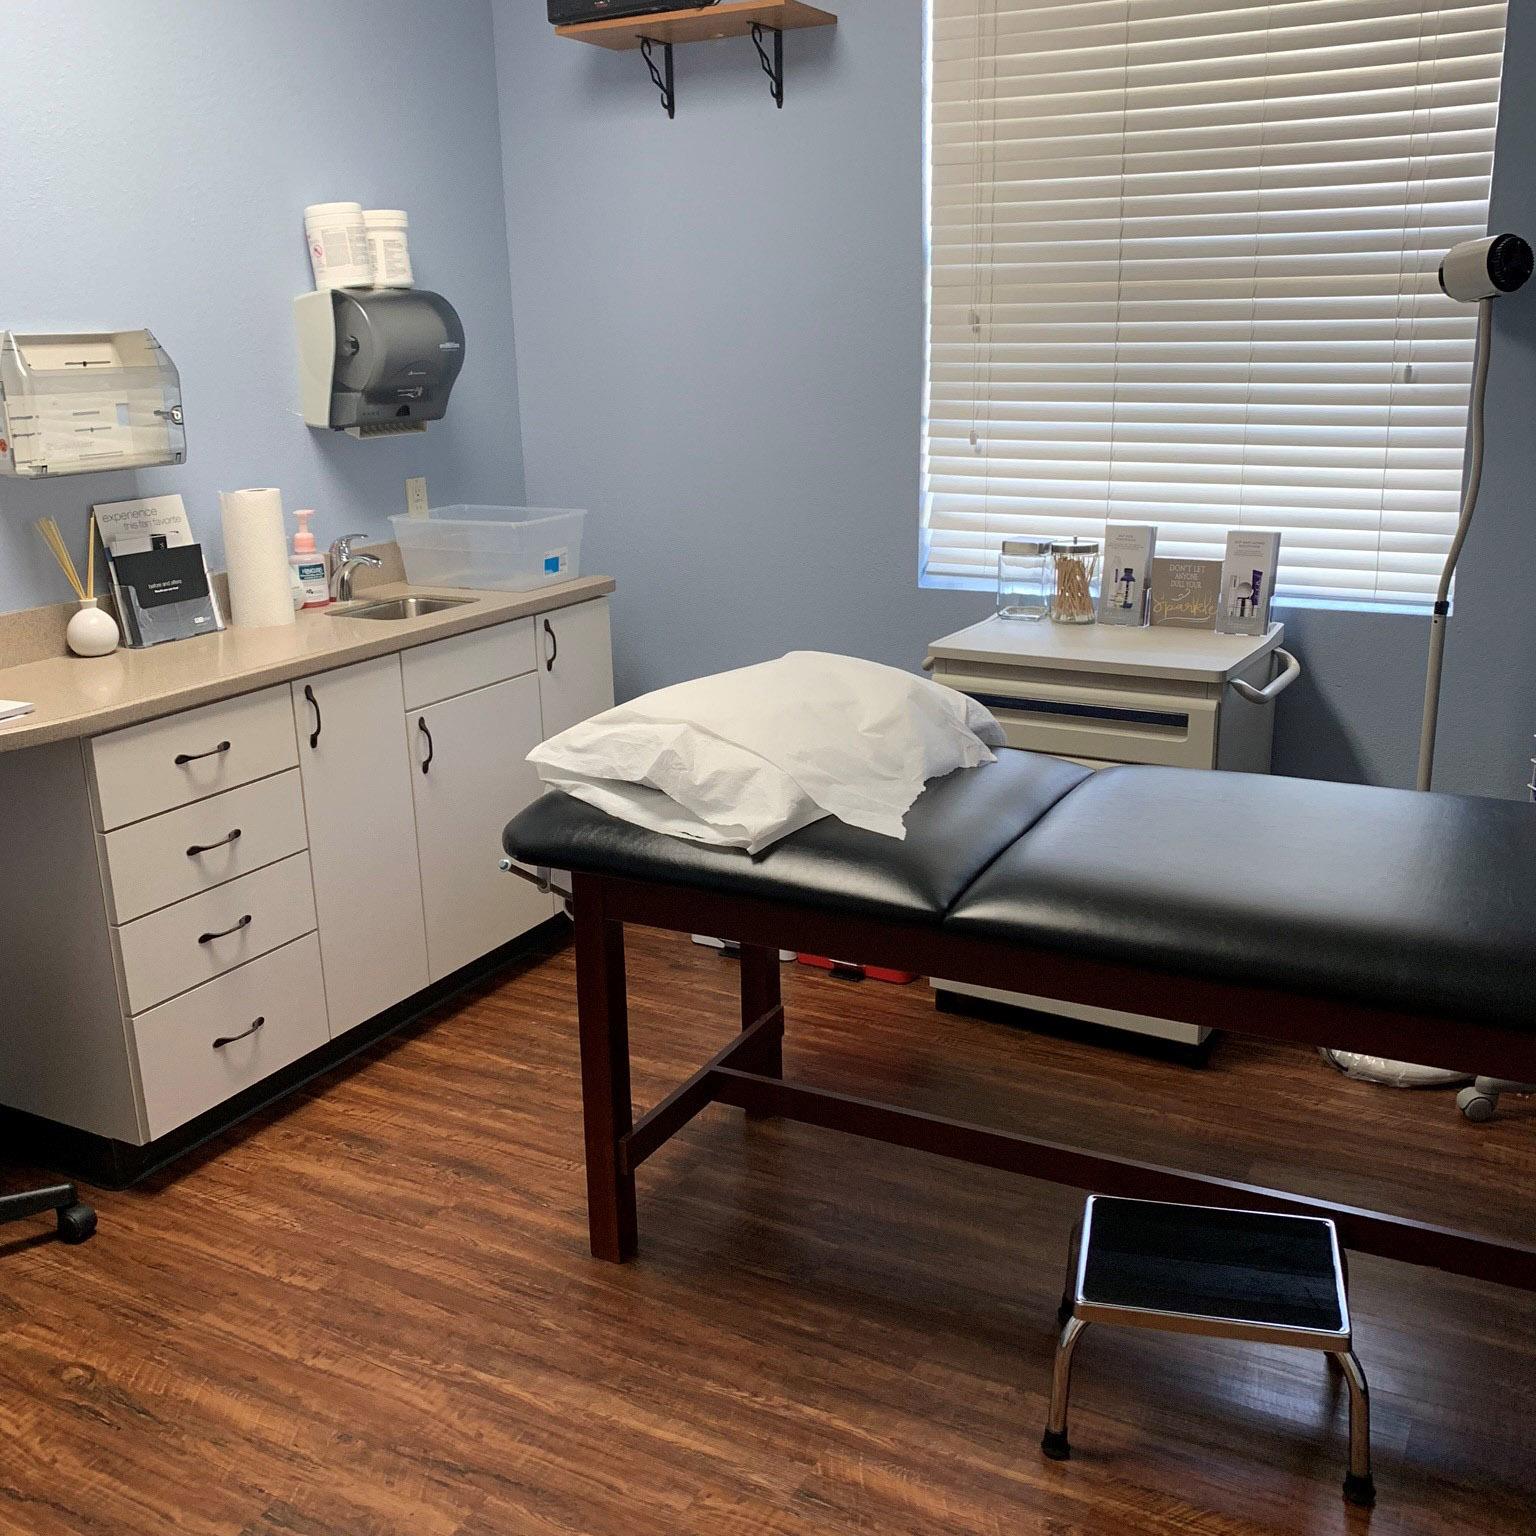 Treatmentroom2.jpg